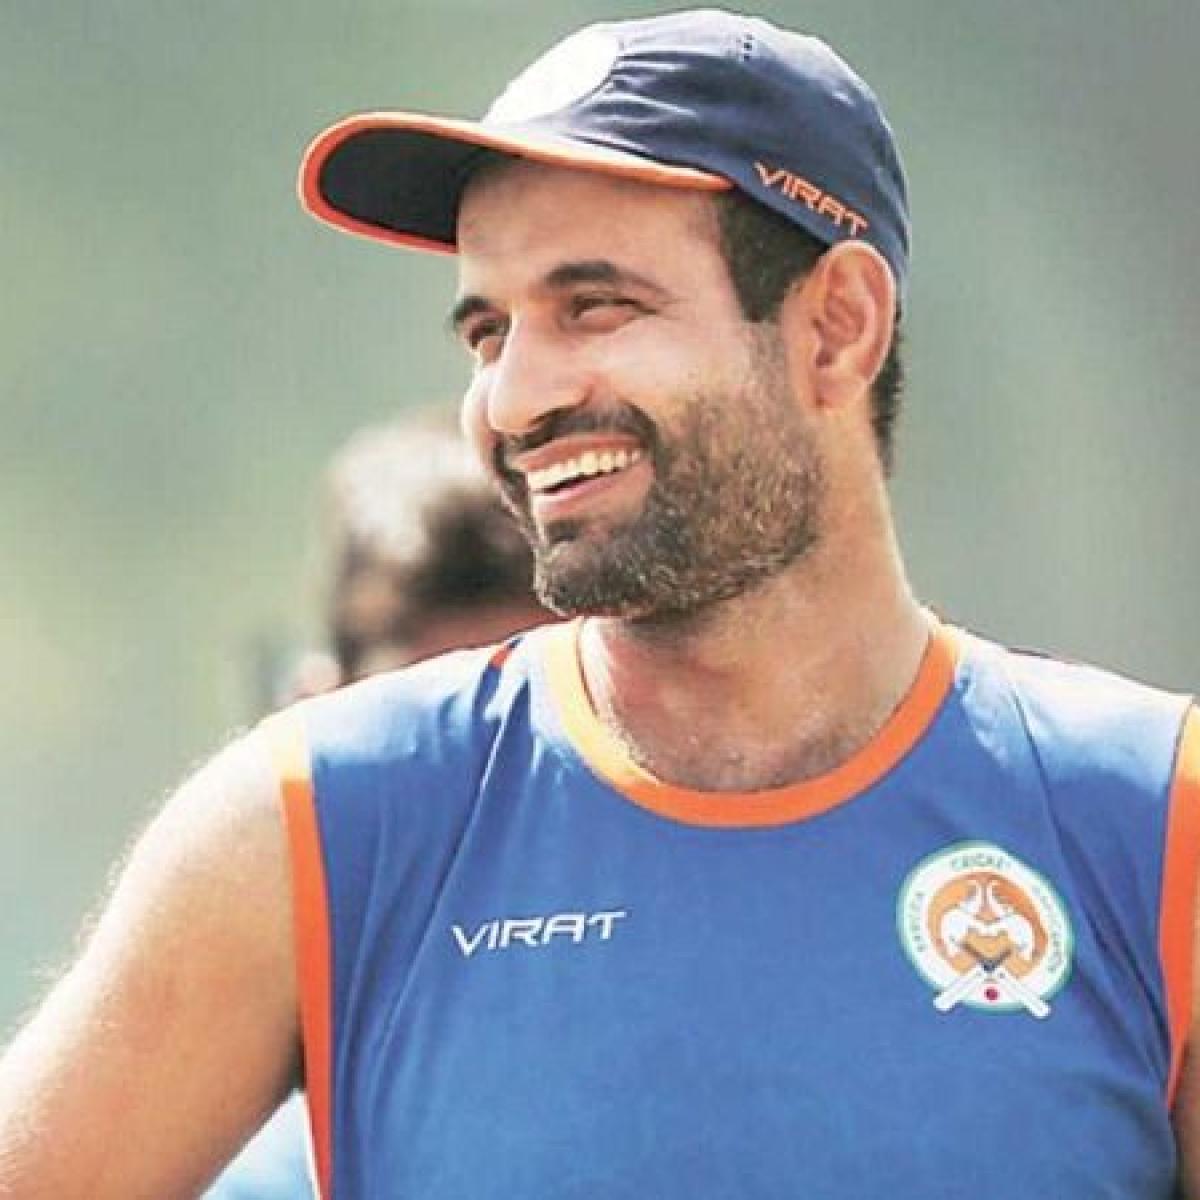 Irfan Pathan uses cricket analogy, urges people to stay home amid coronavirus lockdown